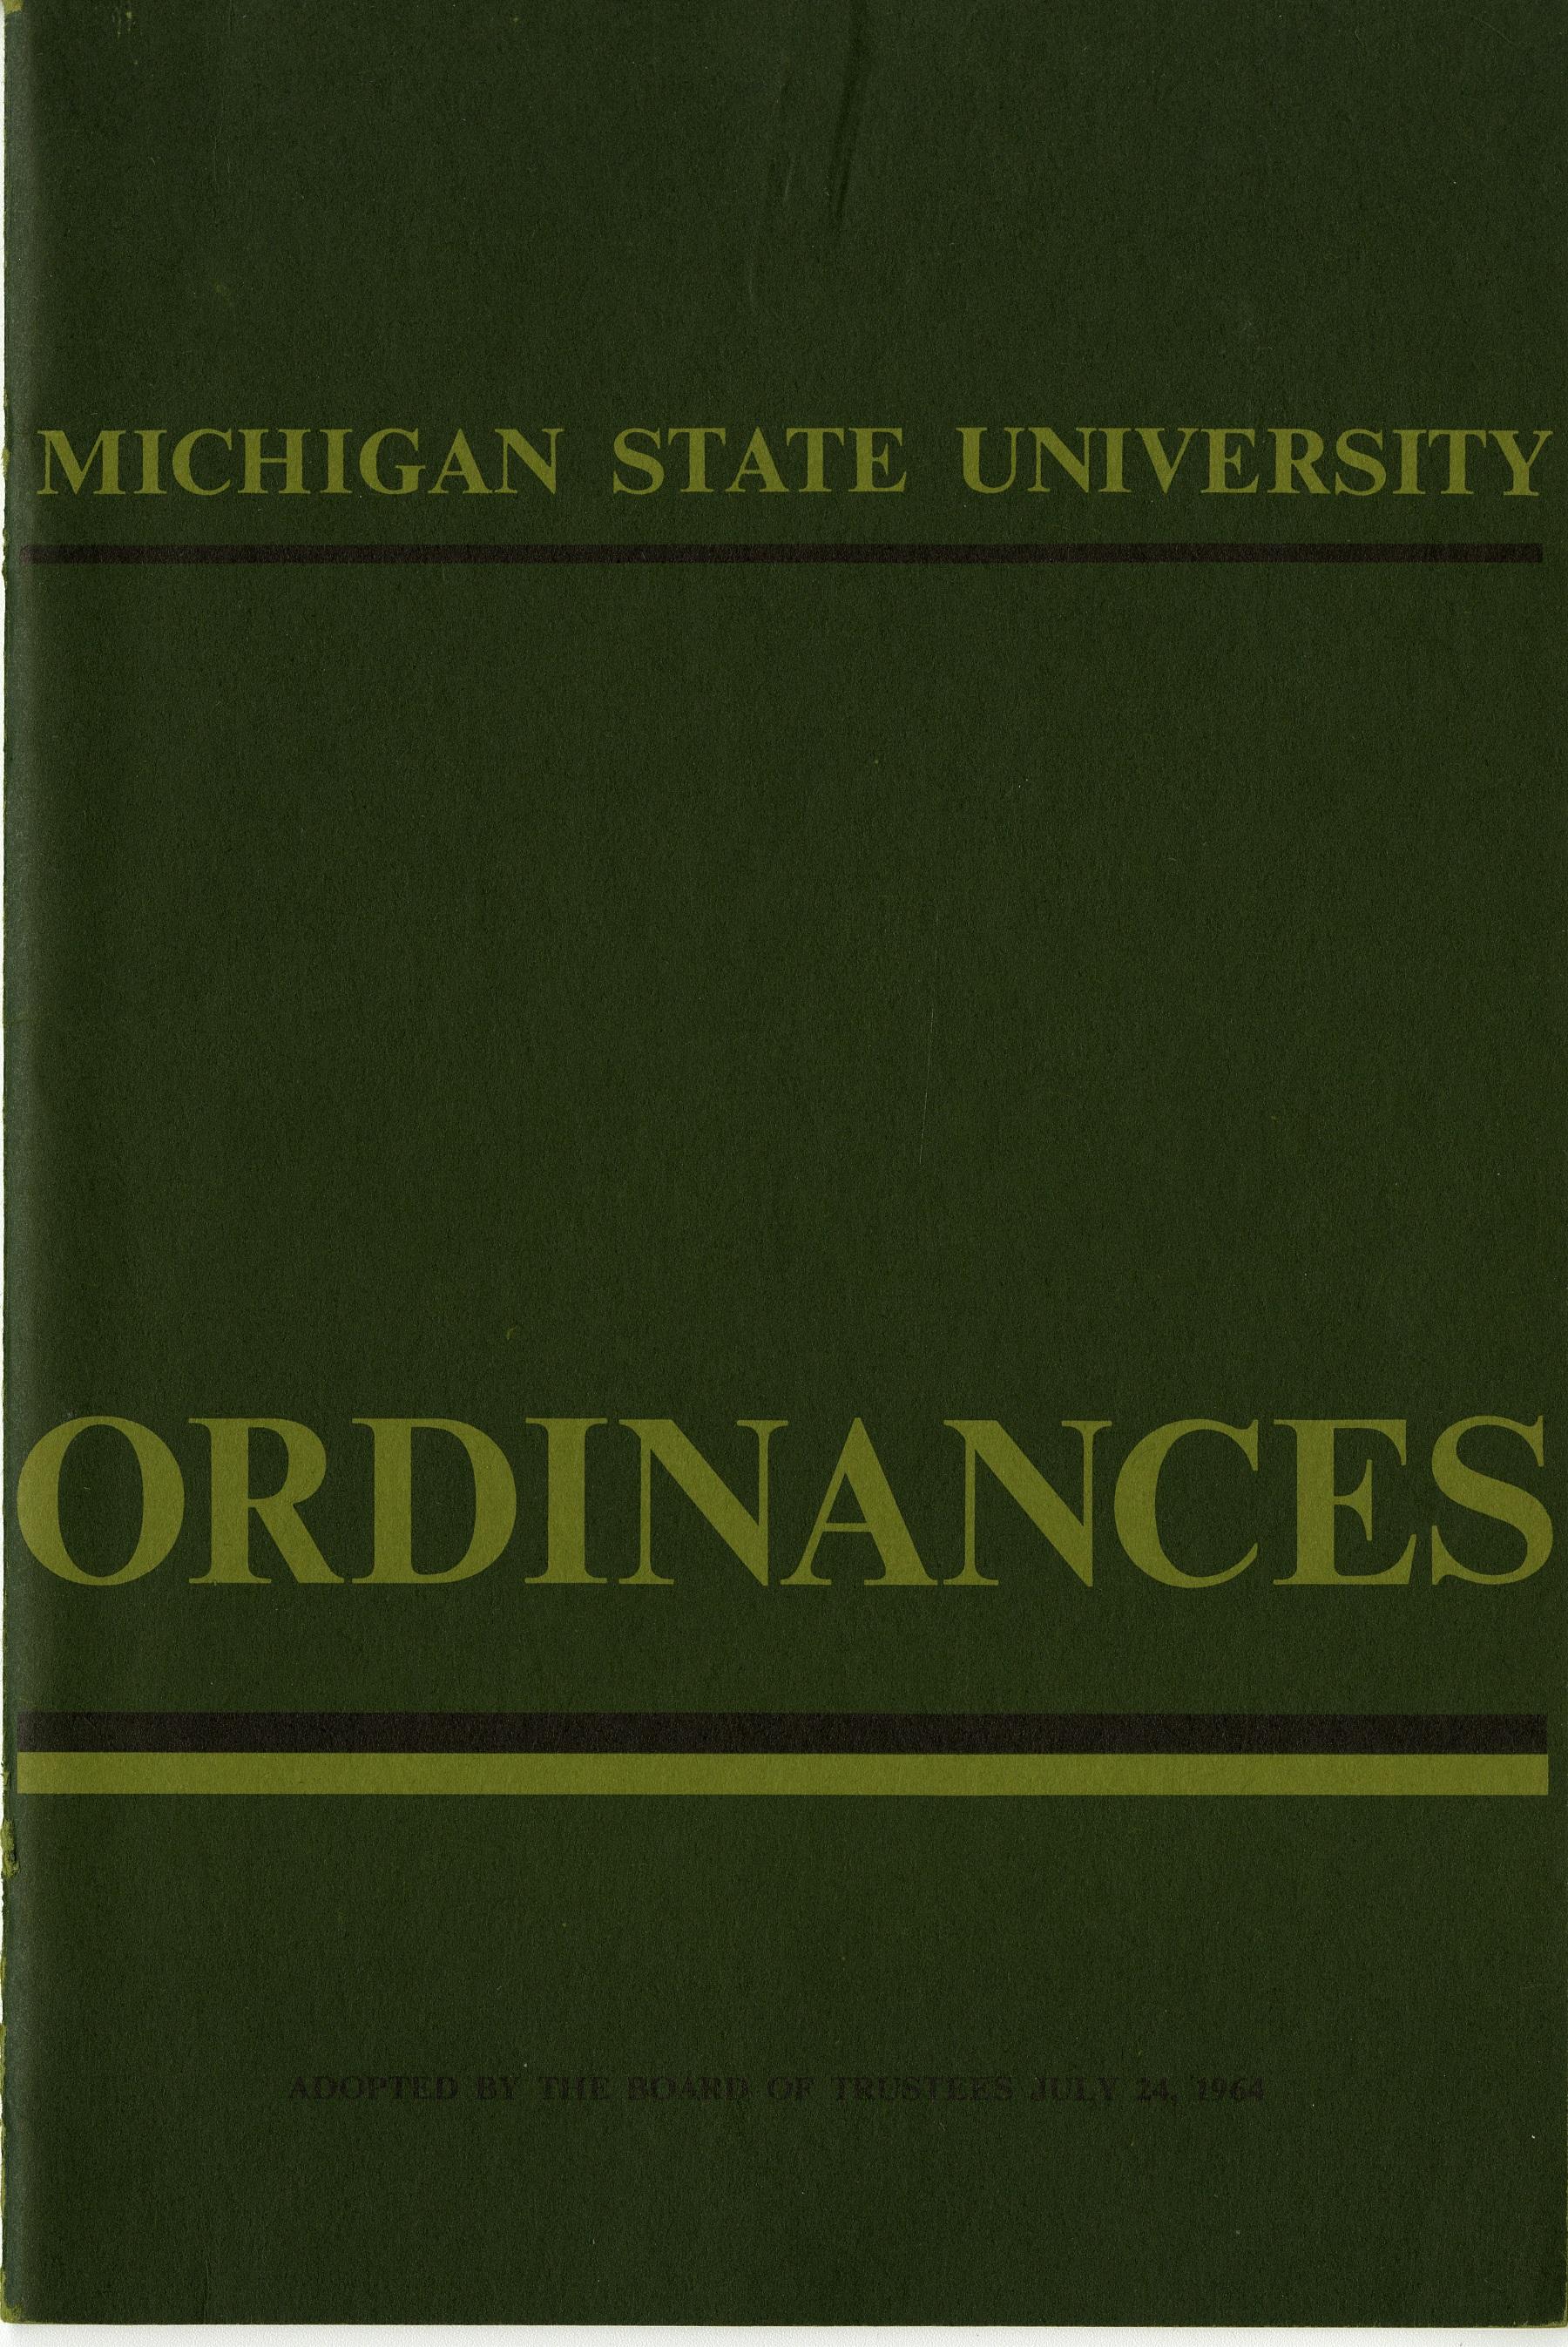 MSU Ordinances, 1964